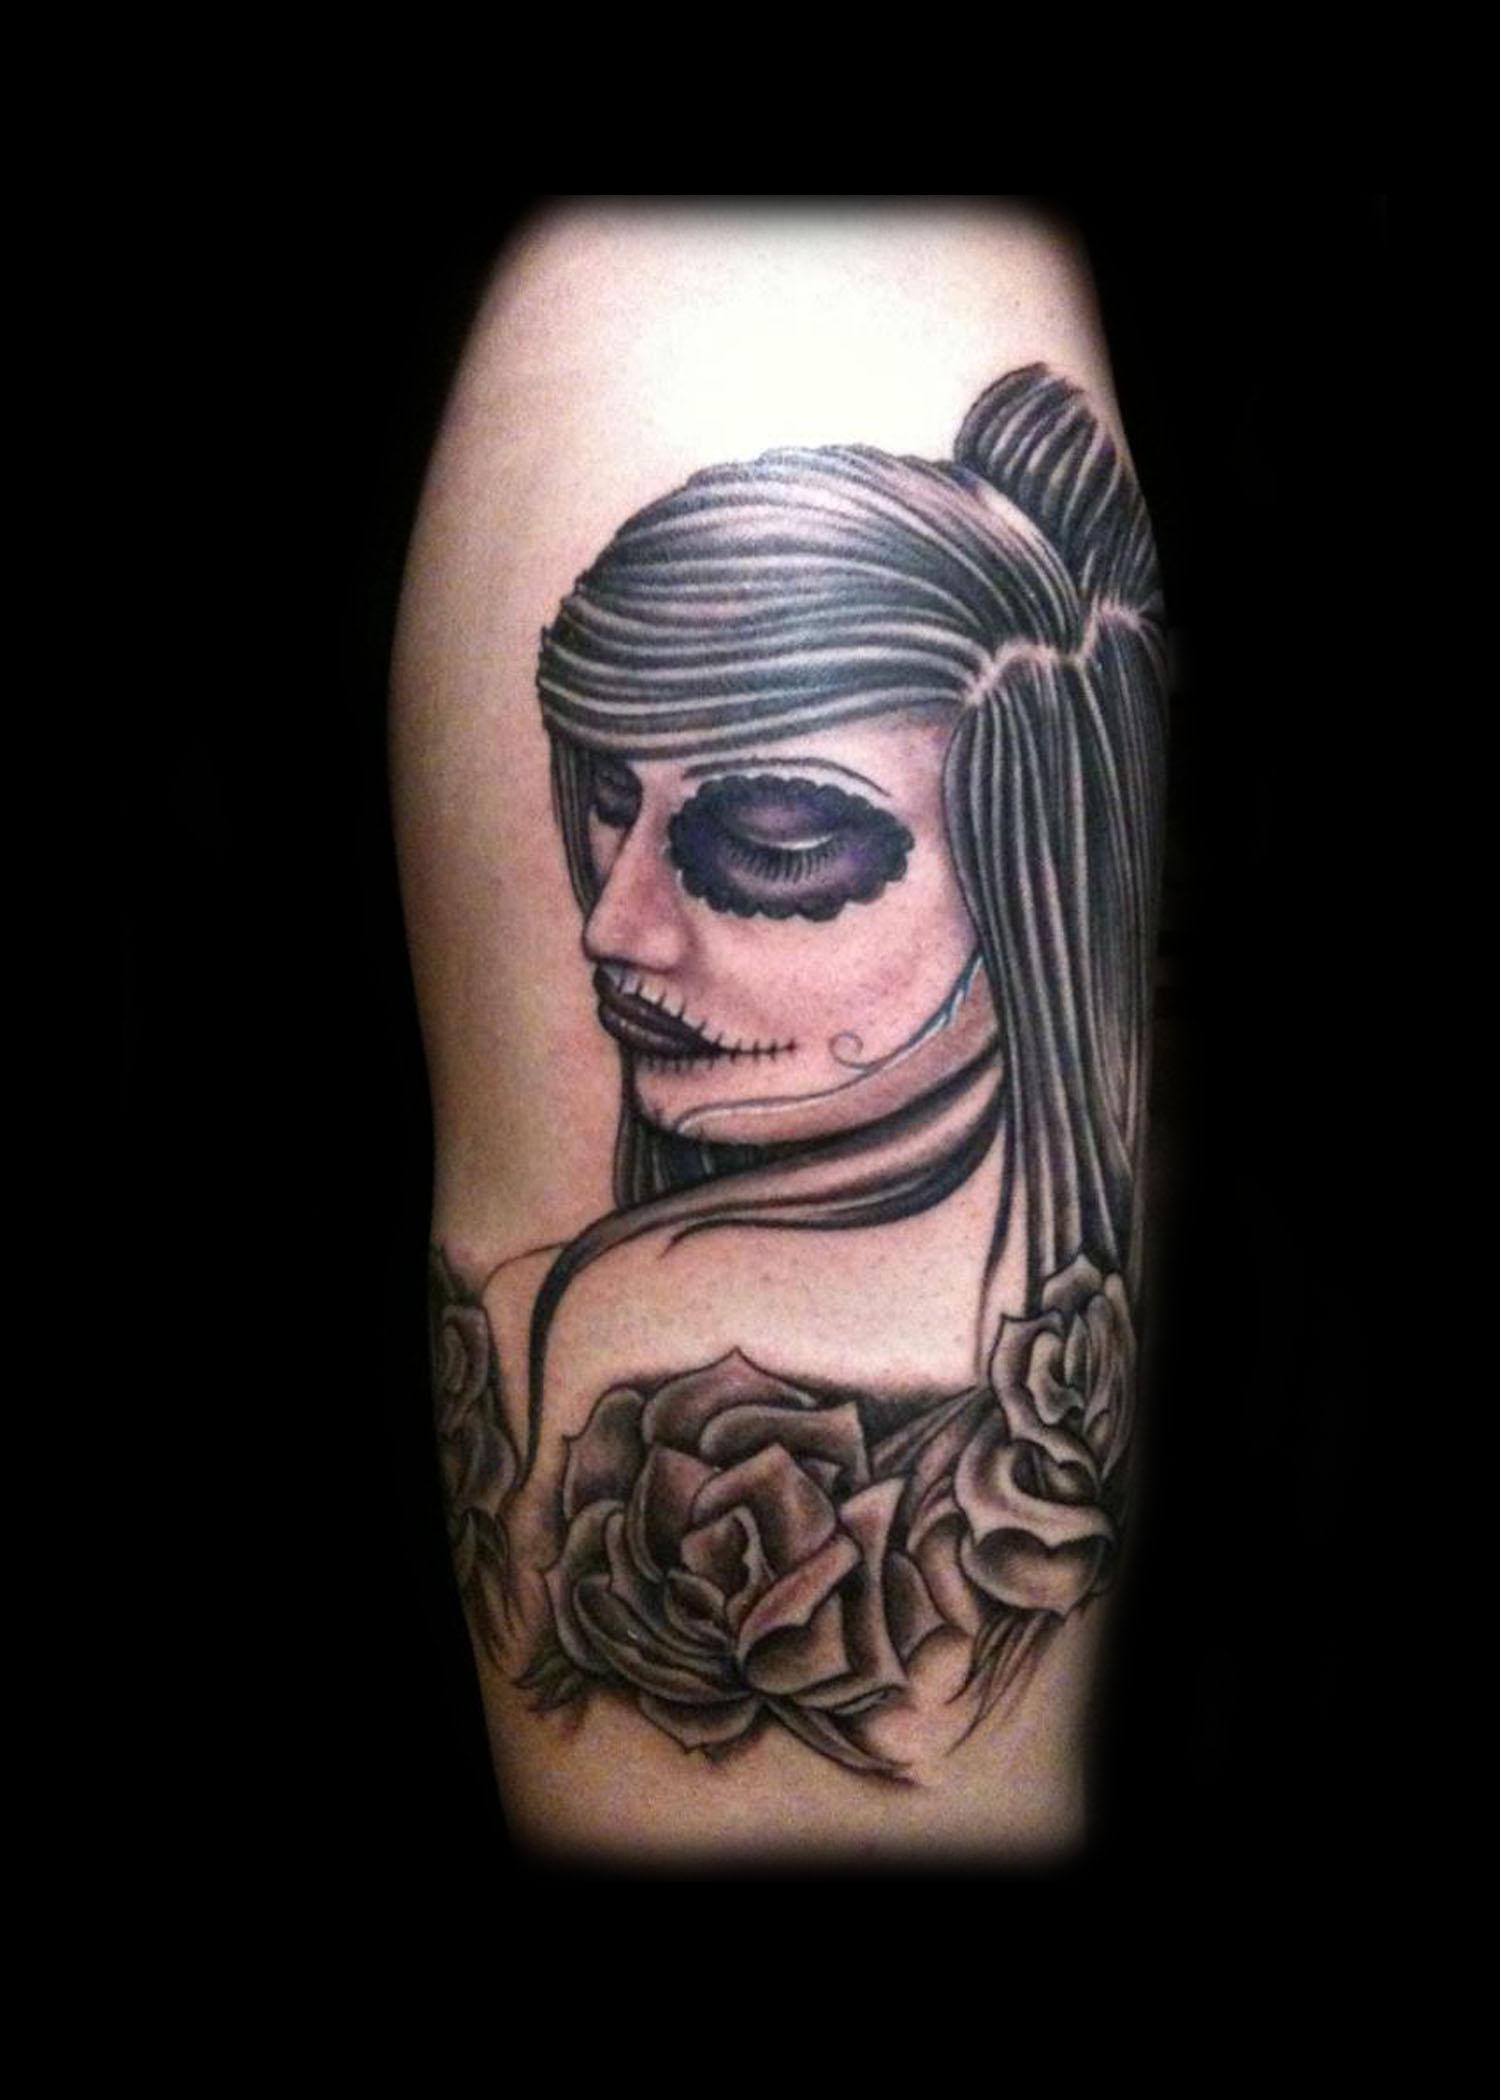 Brandon novak arm tattoos